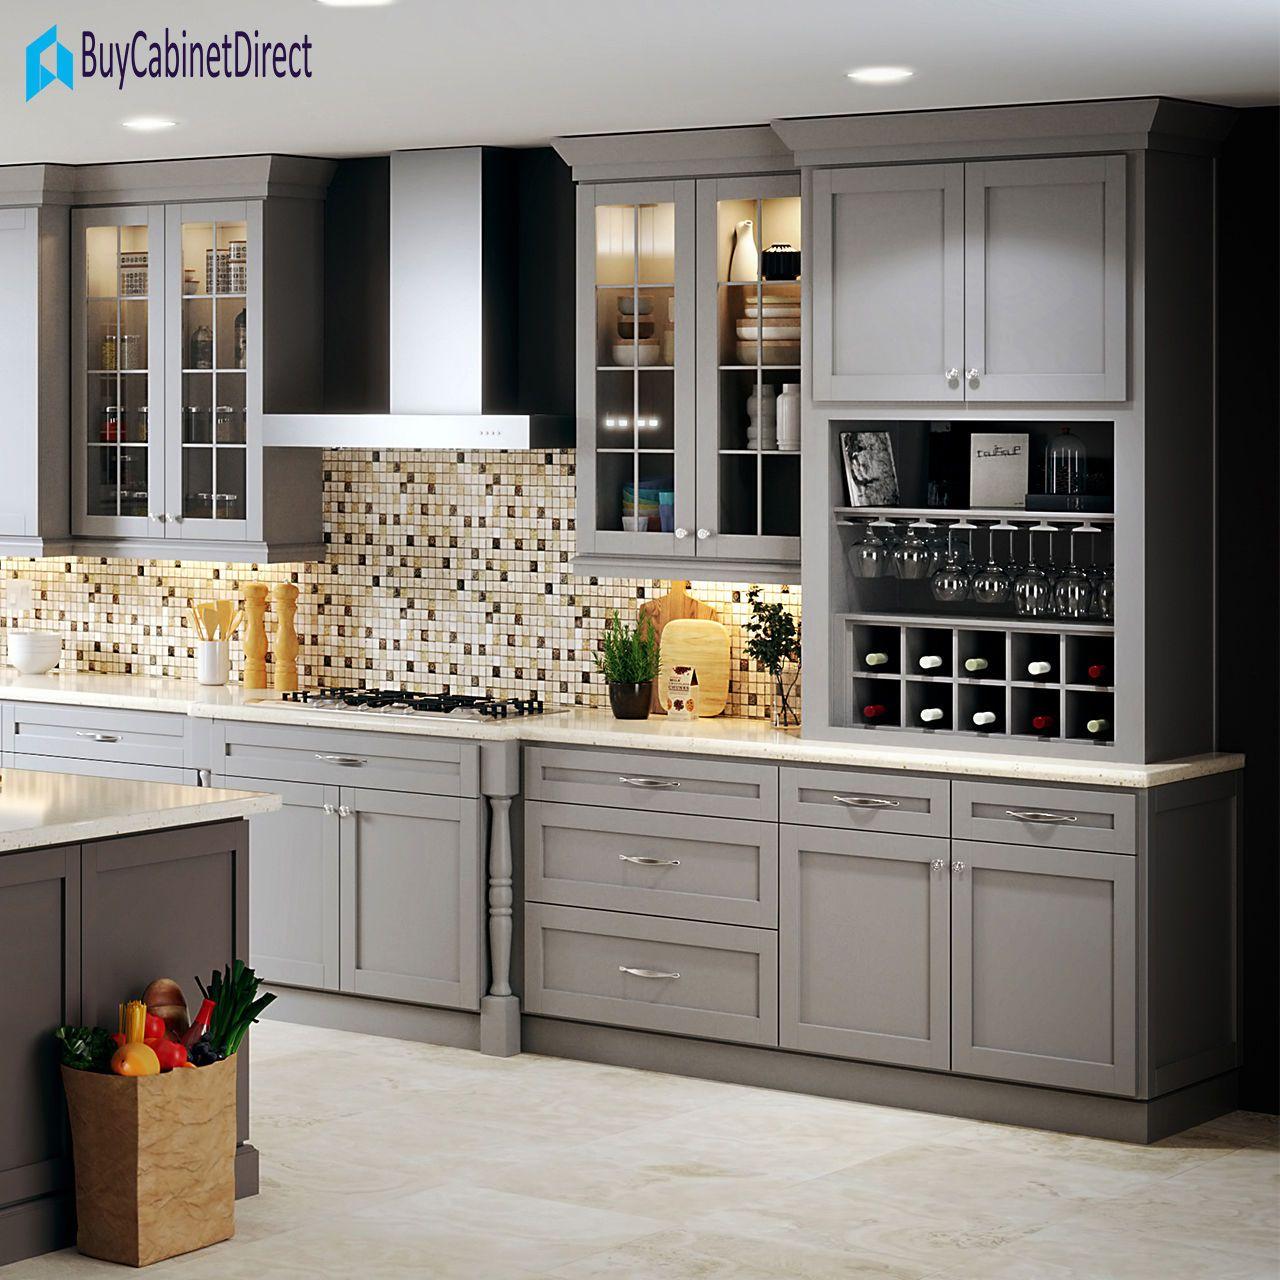 All Wood 10x10 Custom Kitchen Cabinets Lidingo Grey Shaker ...